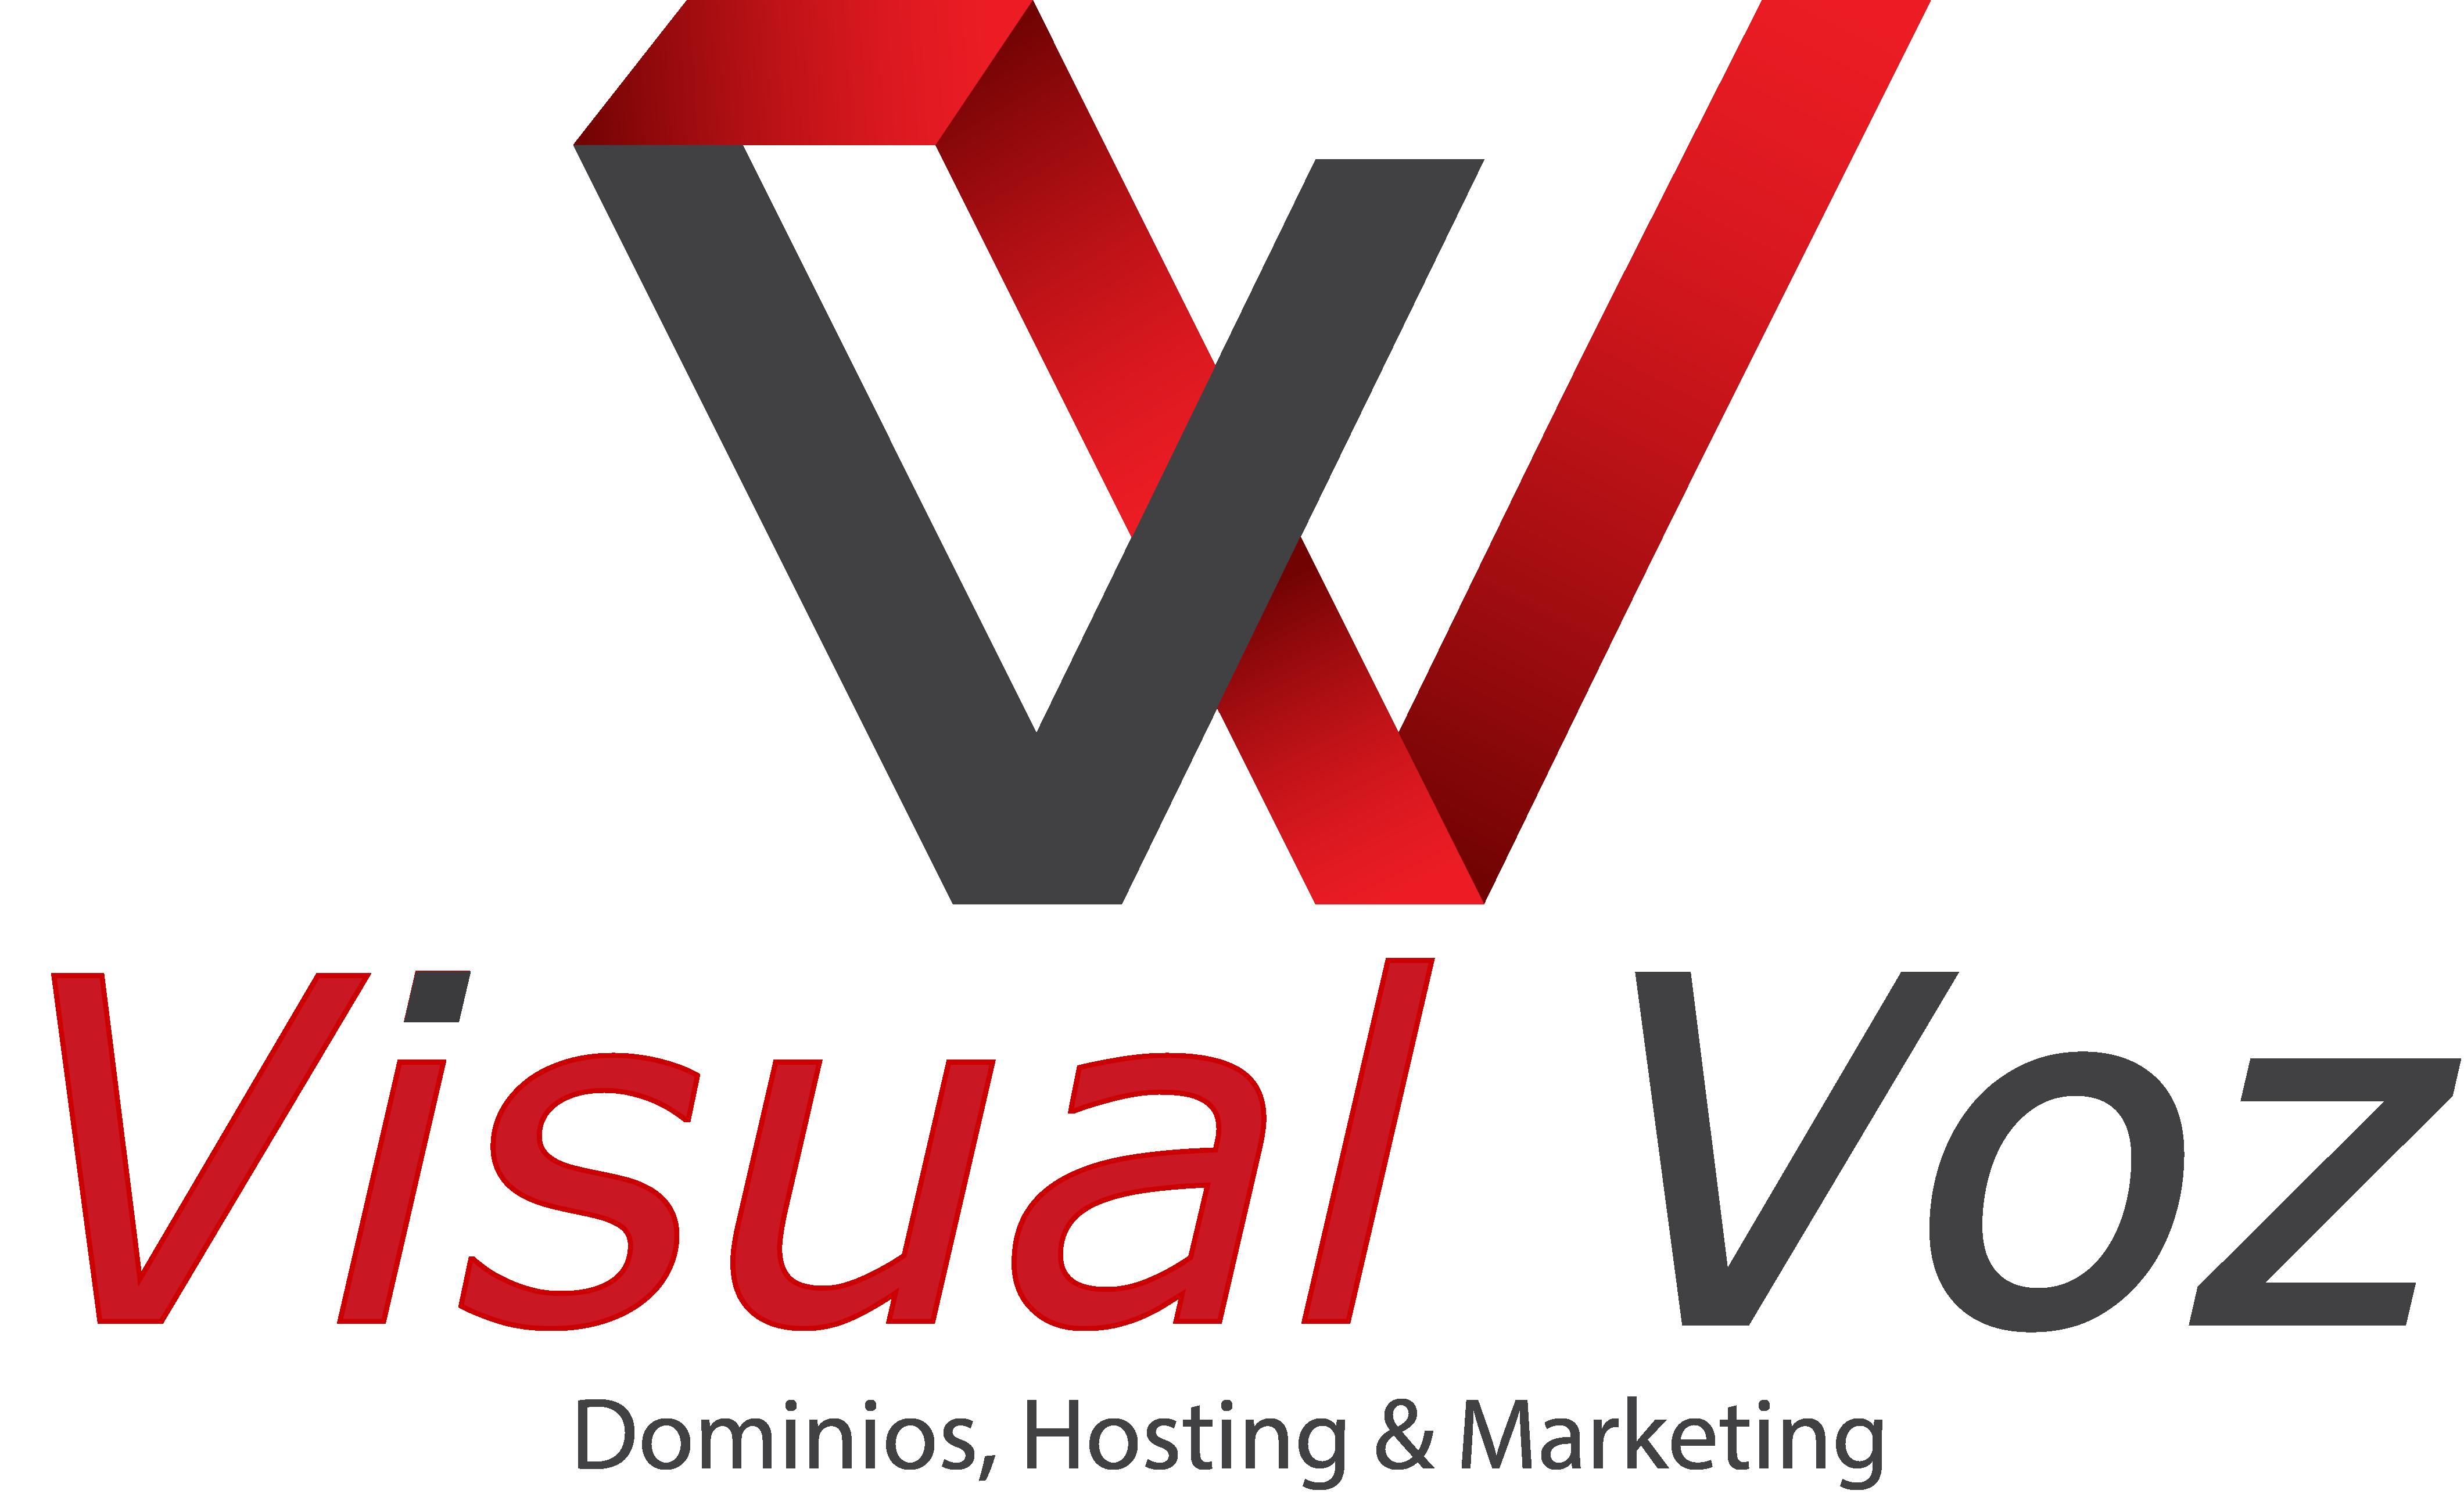 Visual Voz